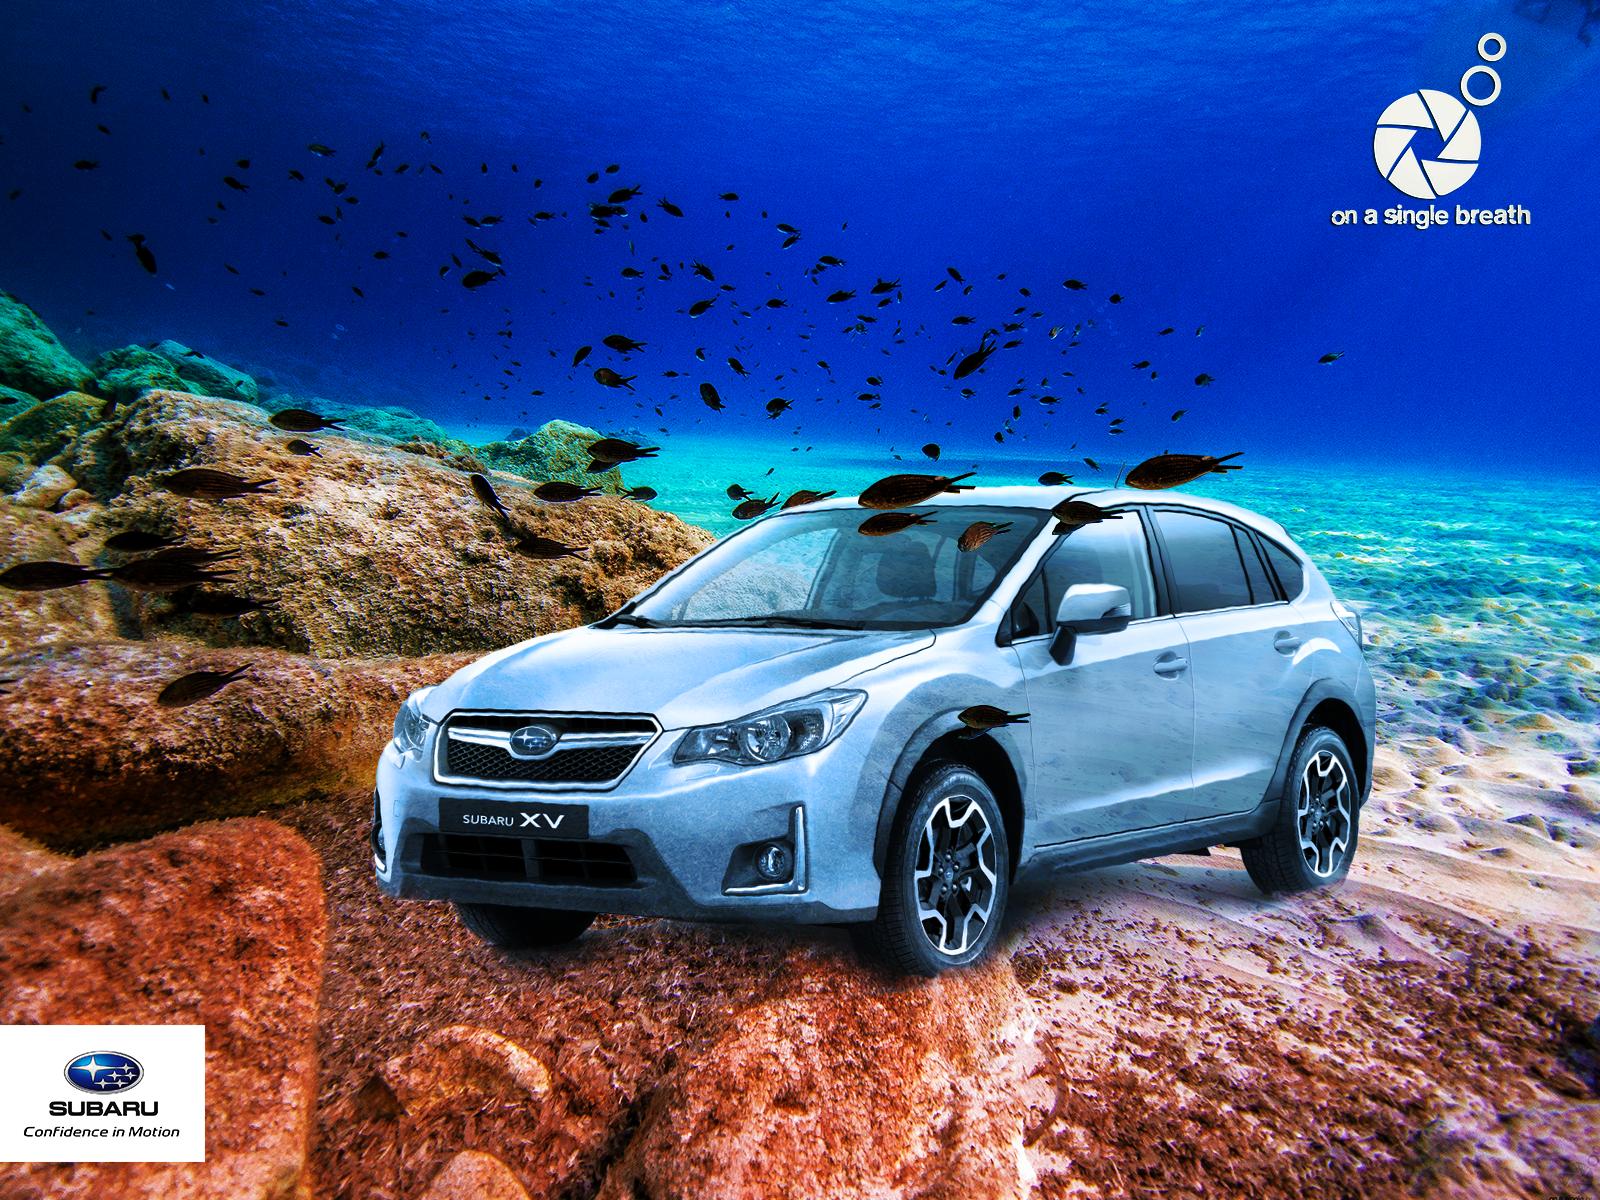 underwater1600X1200 Subaru και «Οn-a-single-breath photography» μαζί στην έκθεση DEEPEX Subaru